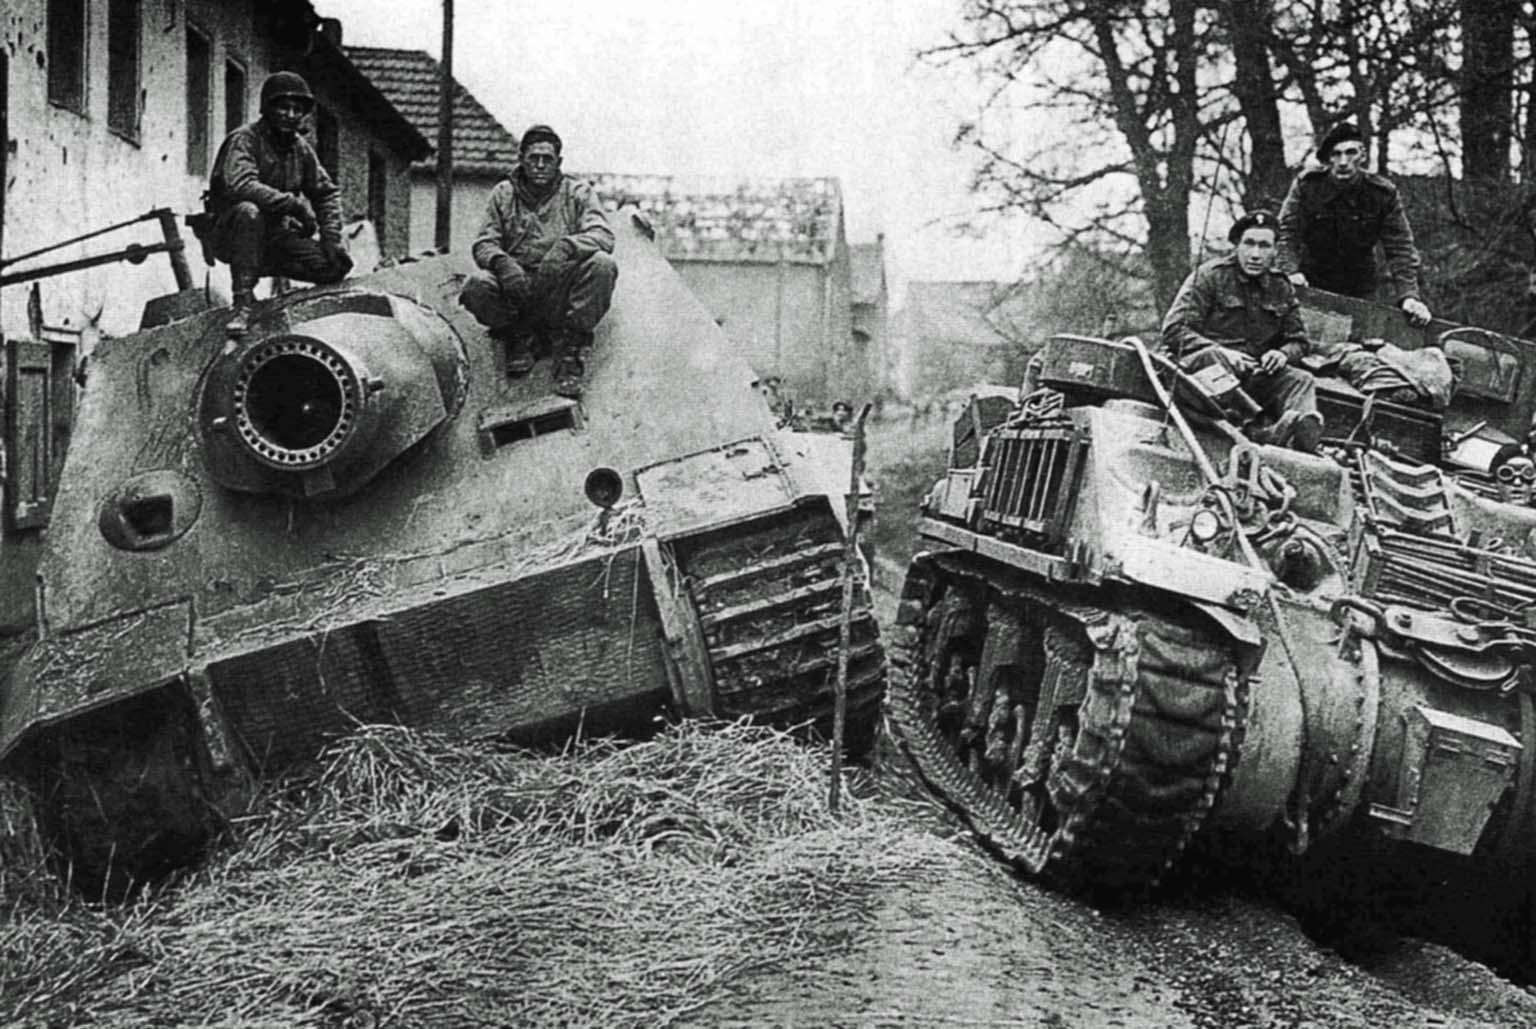 Sturmtiger, M4 ARV